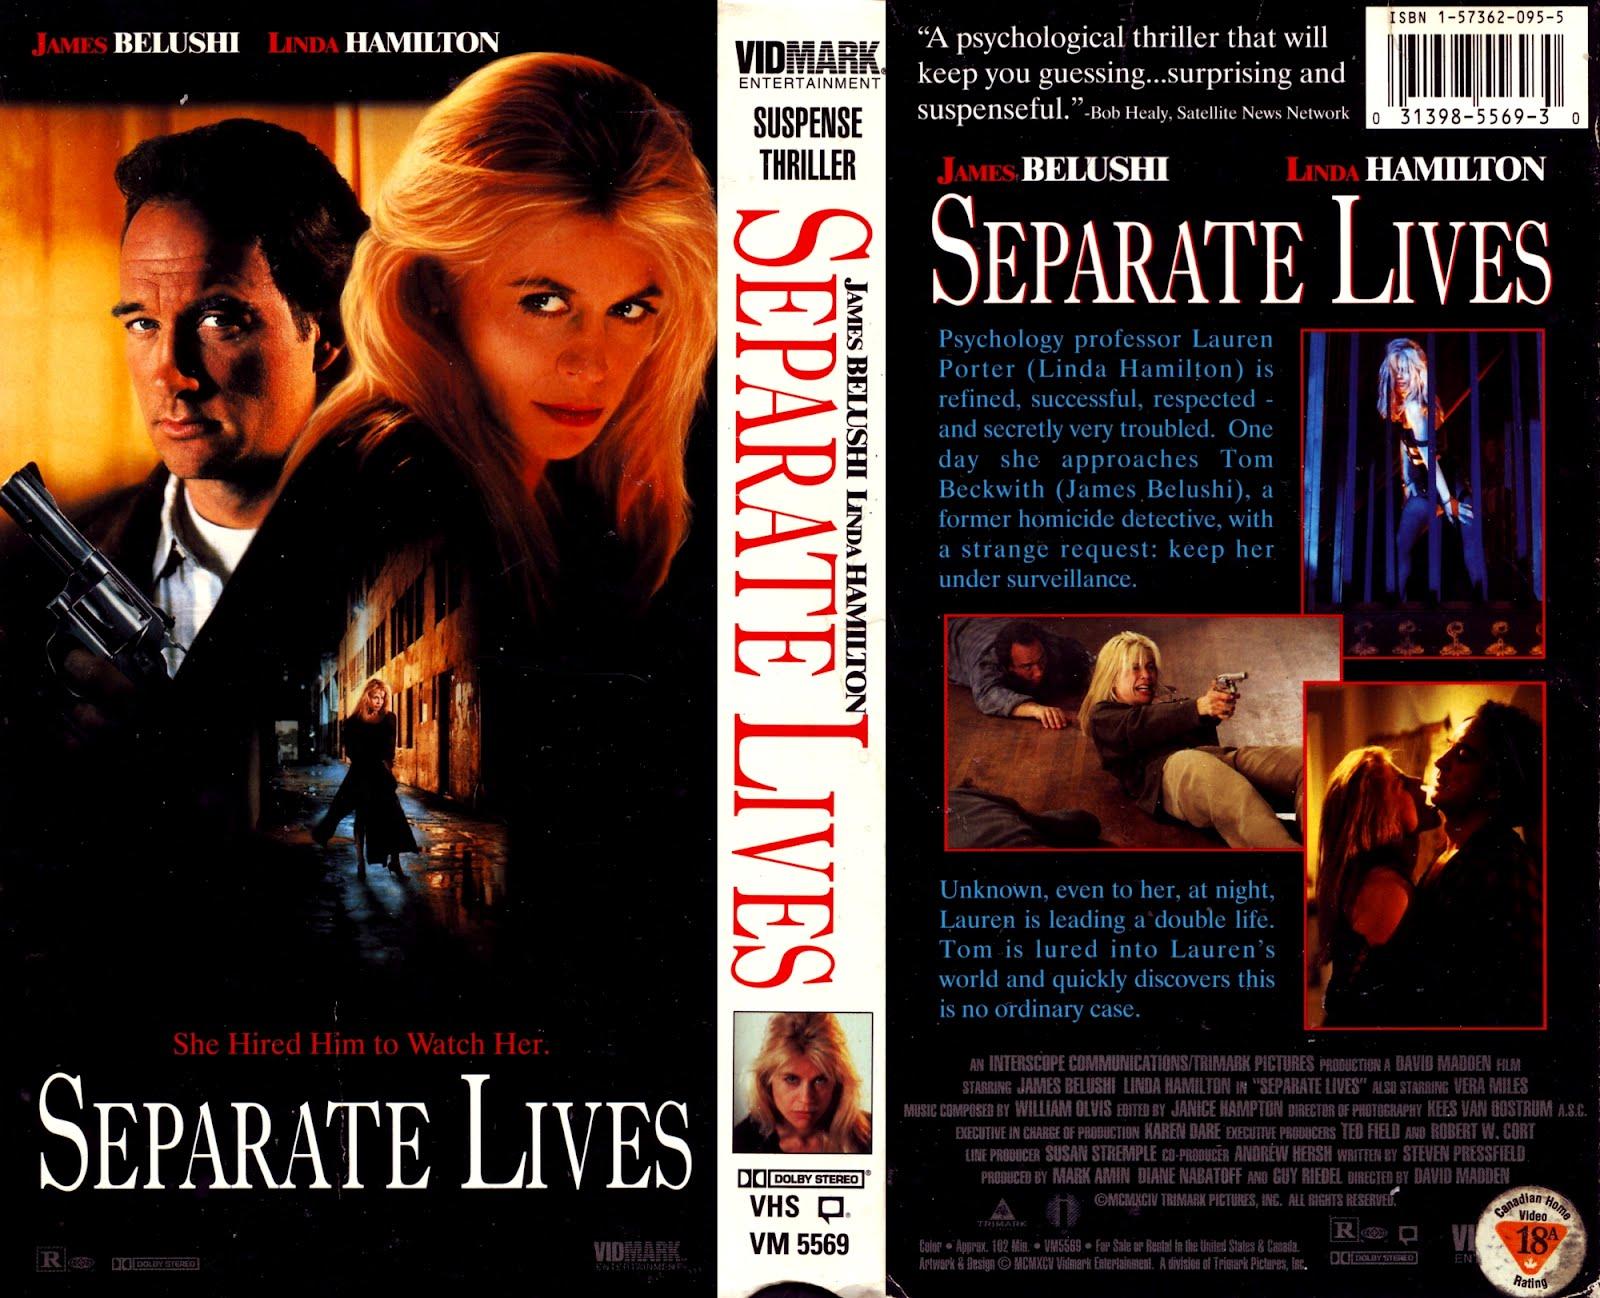 Separate lives movie